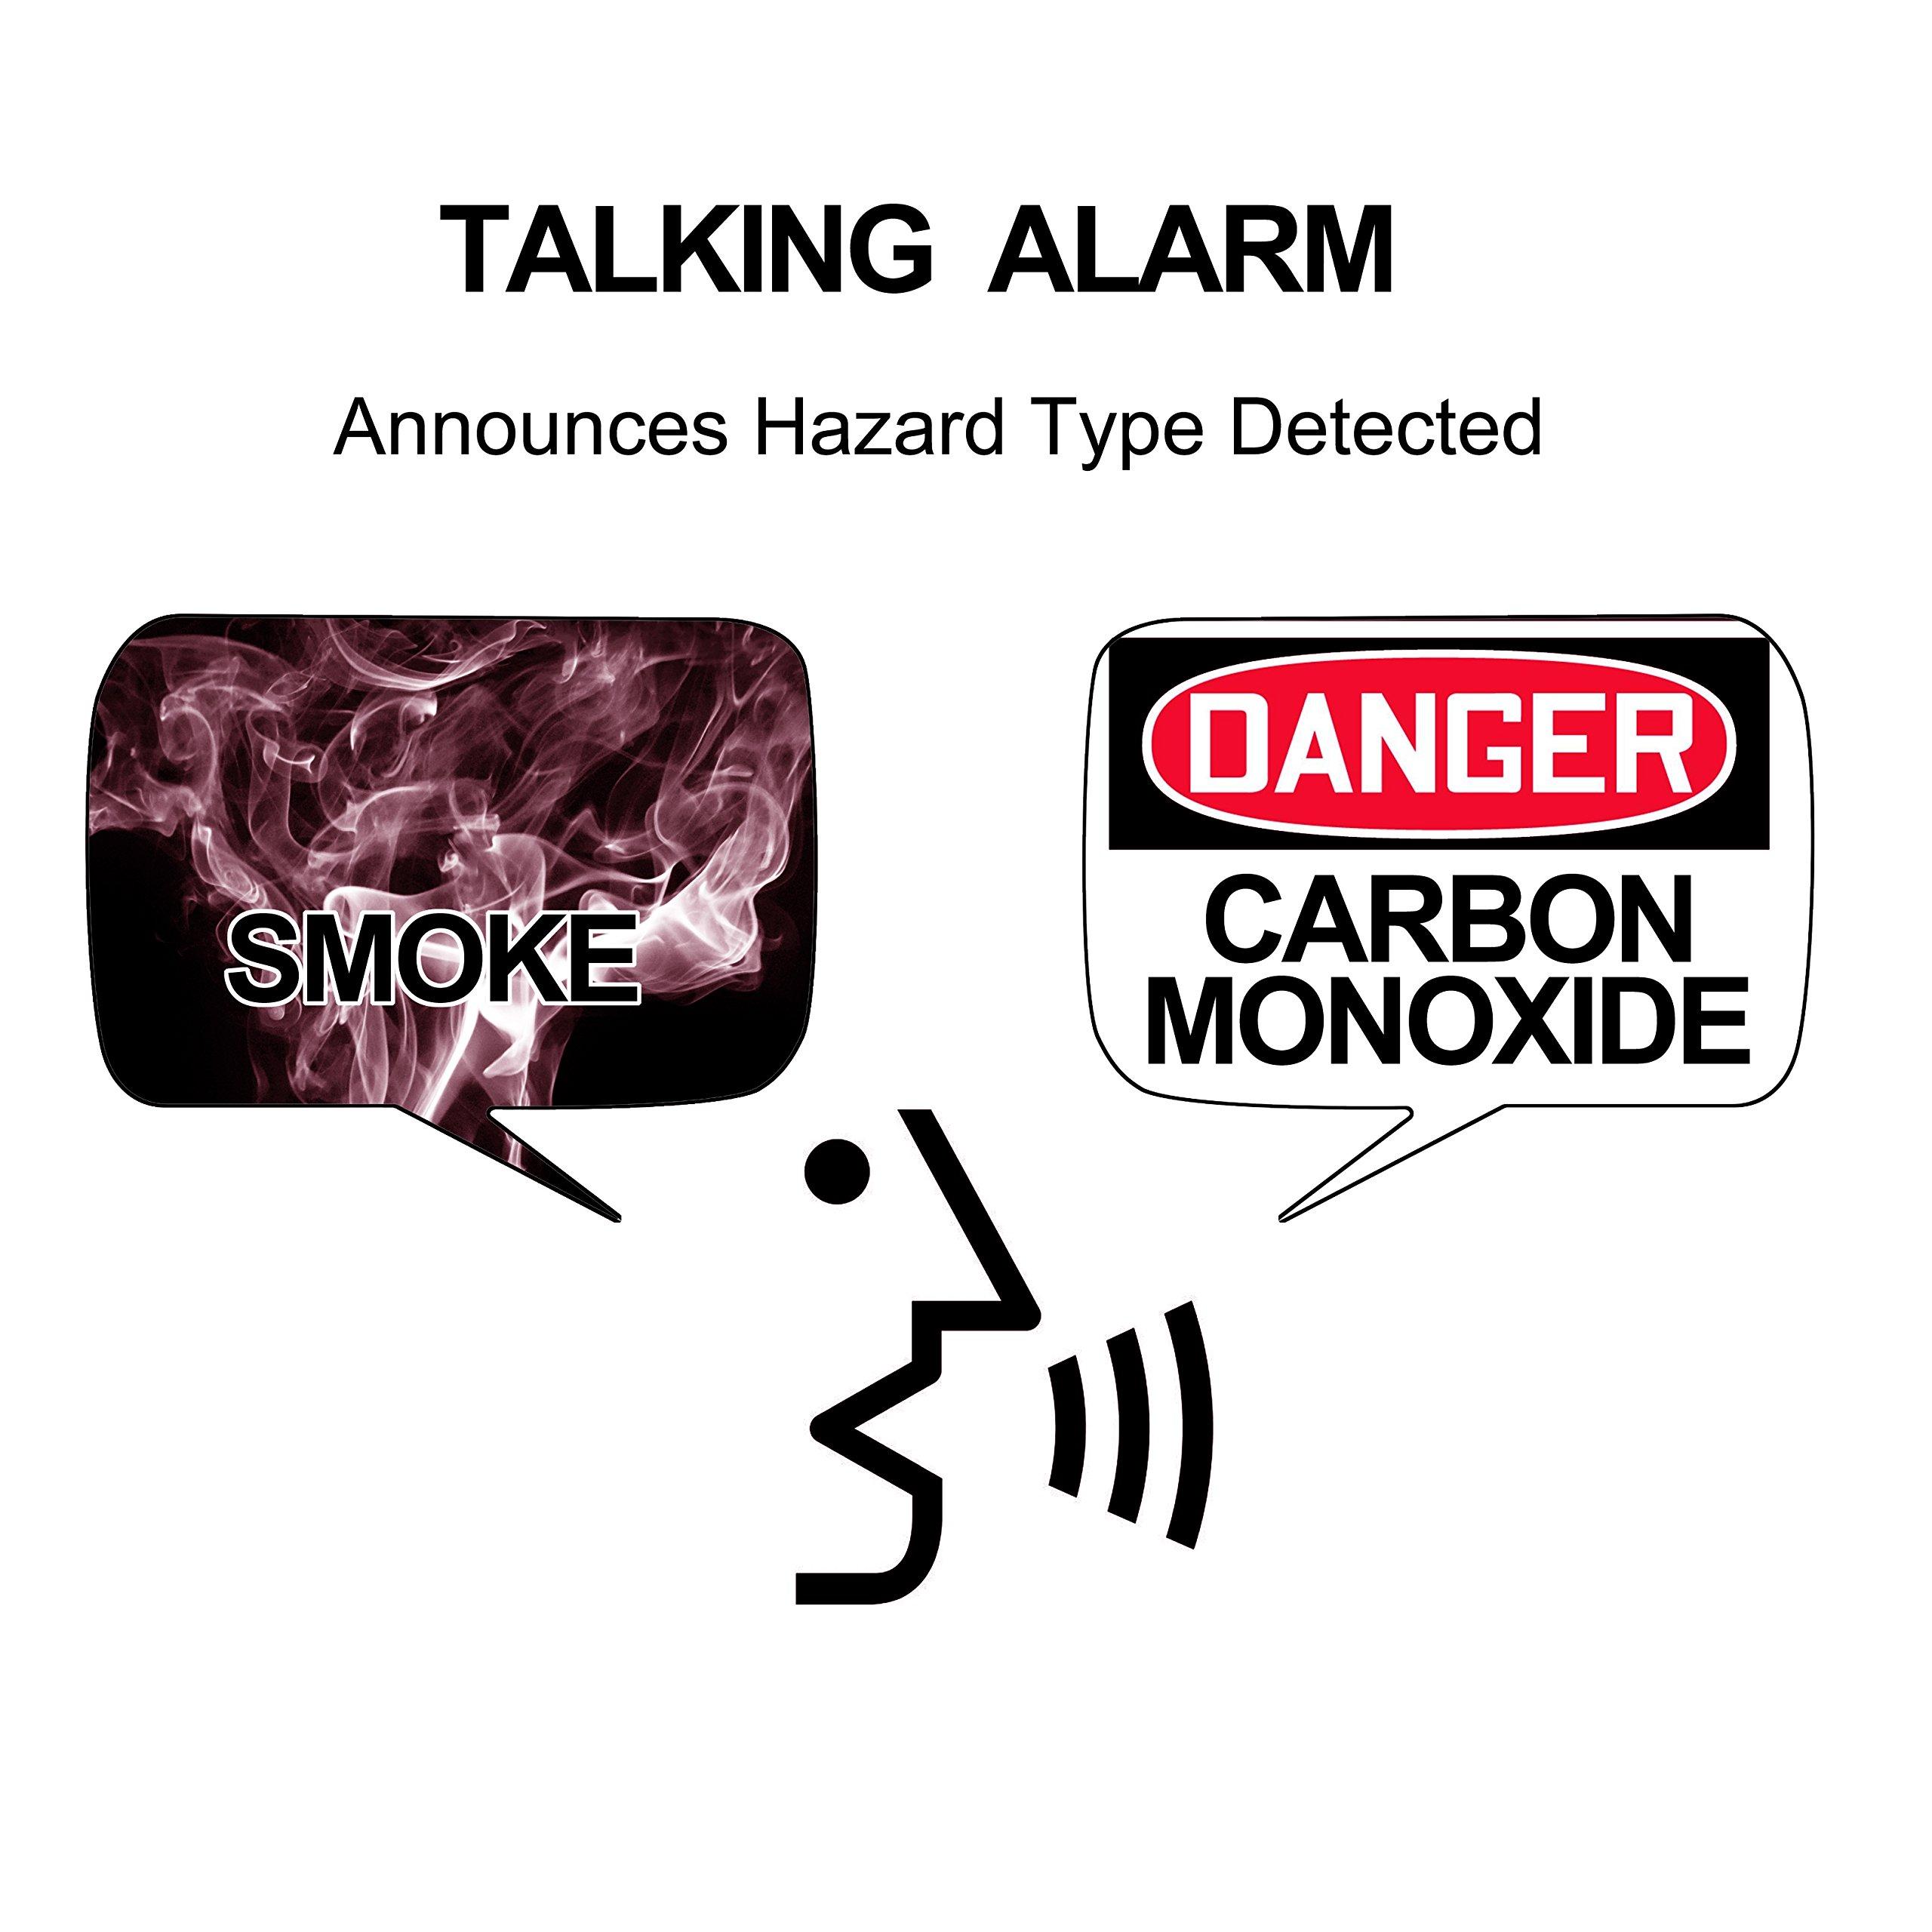 Worry-Free Hardwired Smoke & Carbon Monoxide Alarm with Lithium Battery Backup I12010SCO by Kidde (Image #3)